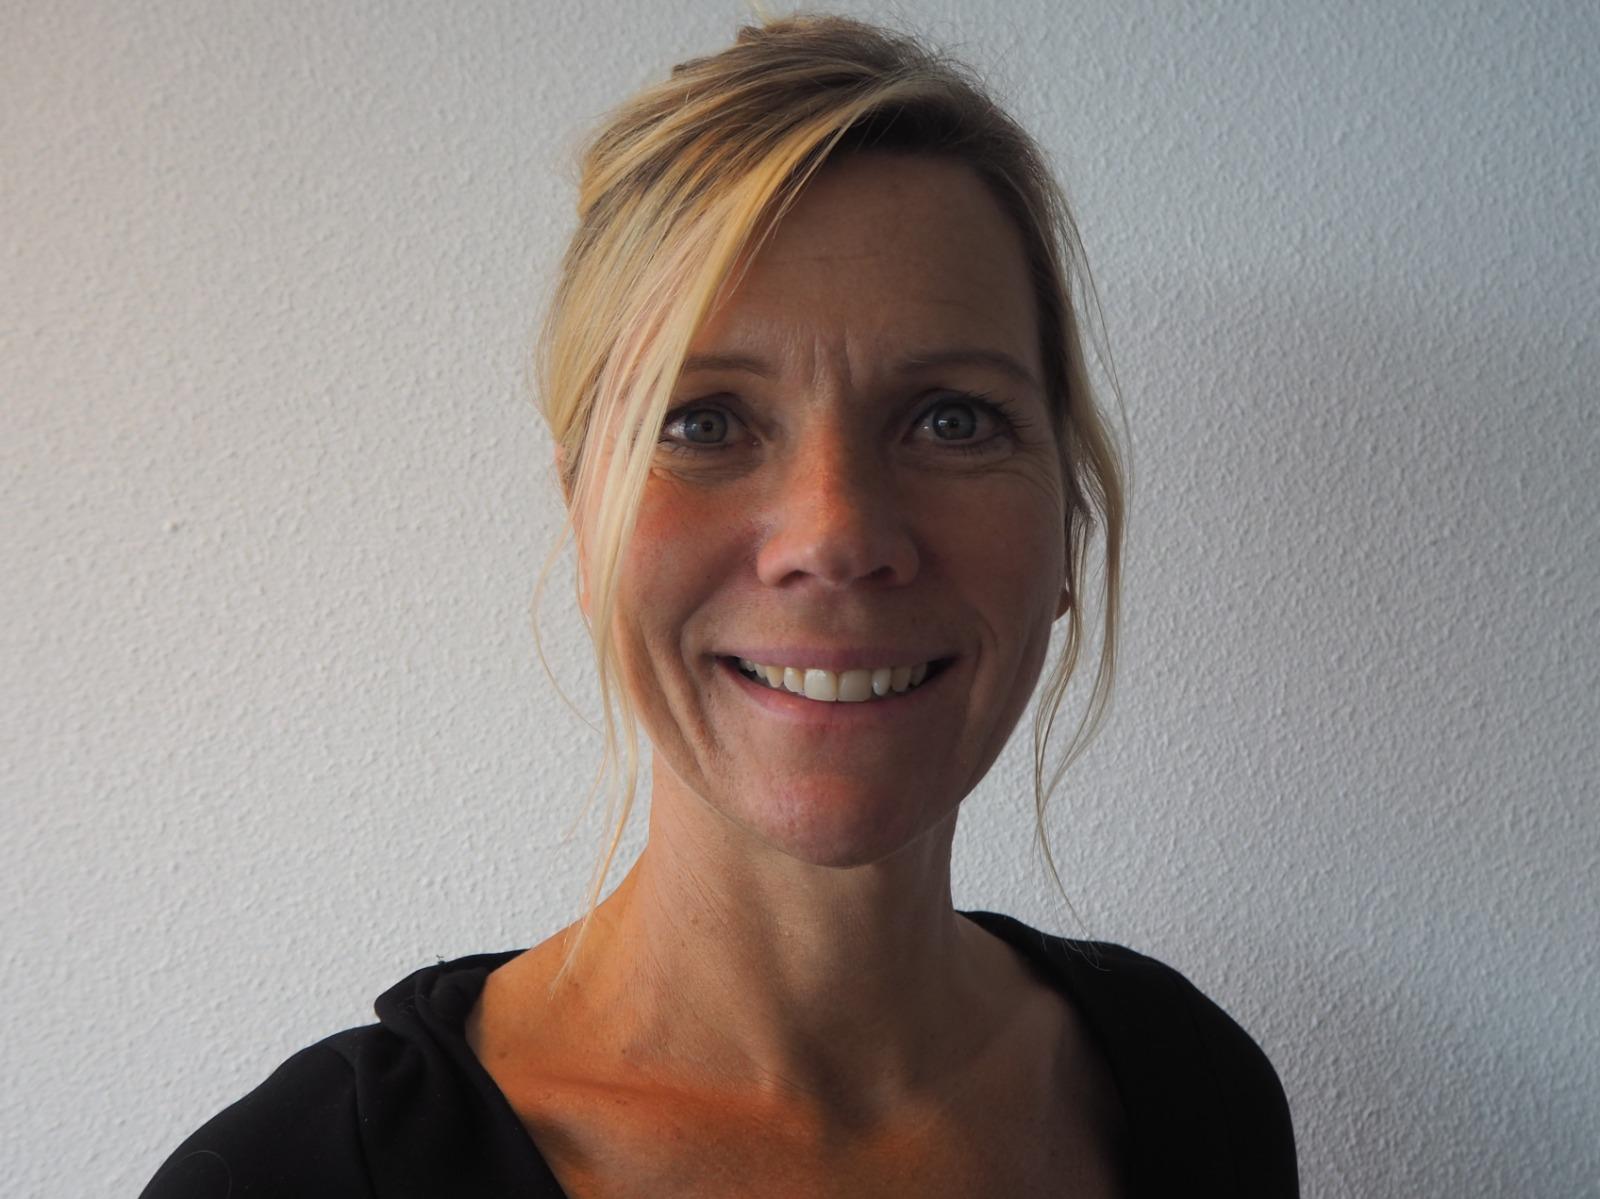 Ingeborg Minjon